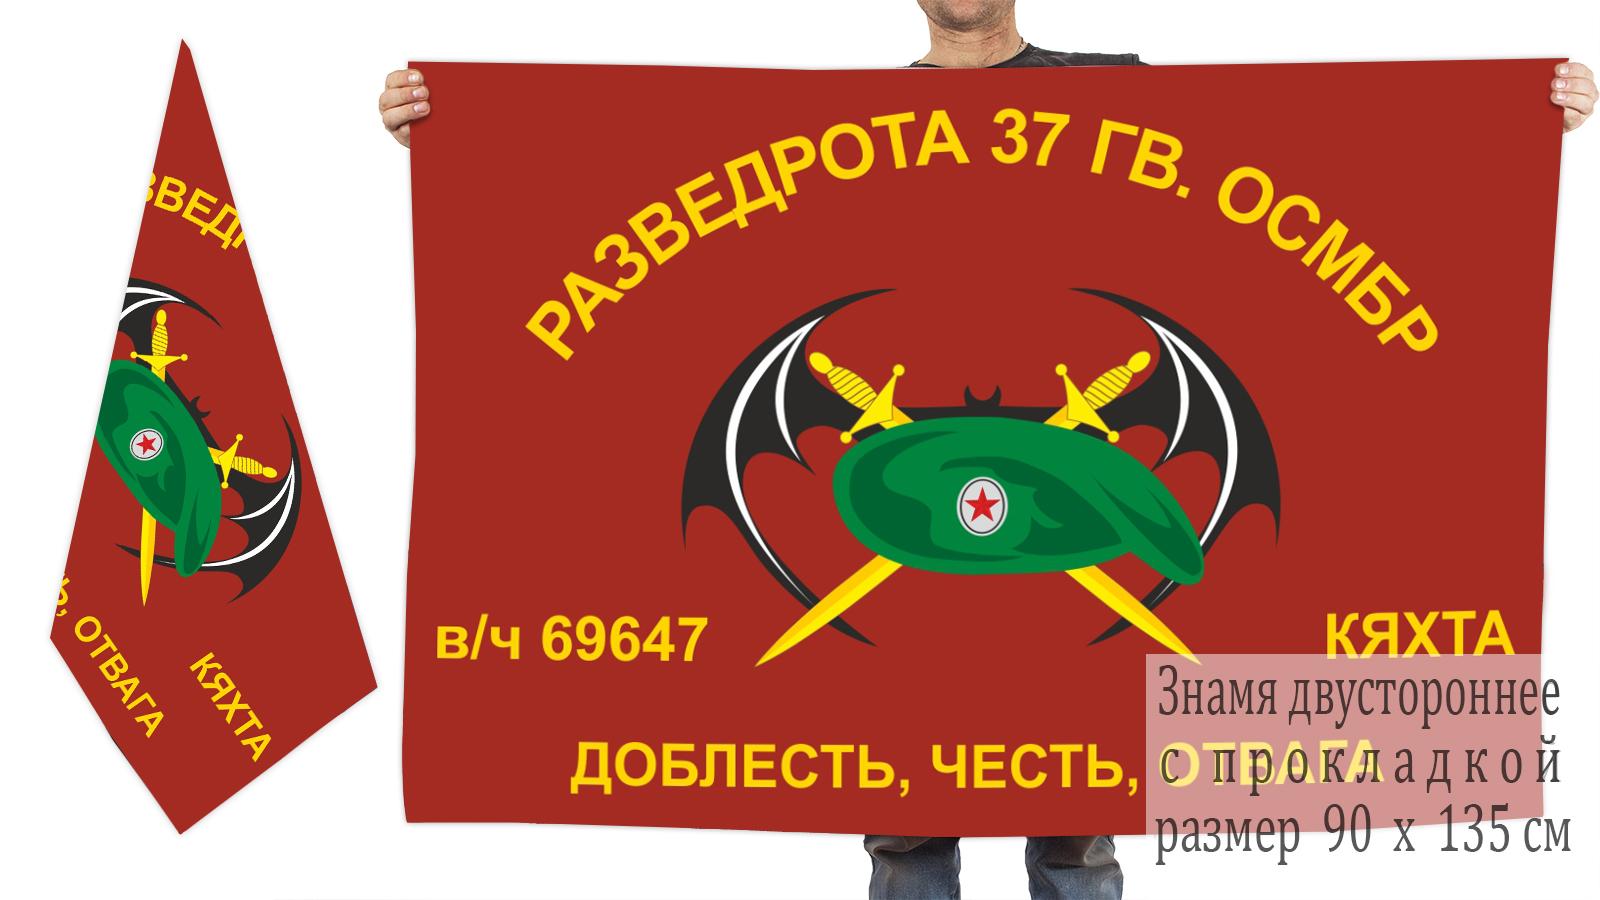 Двусторонний флаг Разведроты 37 ОМСБр